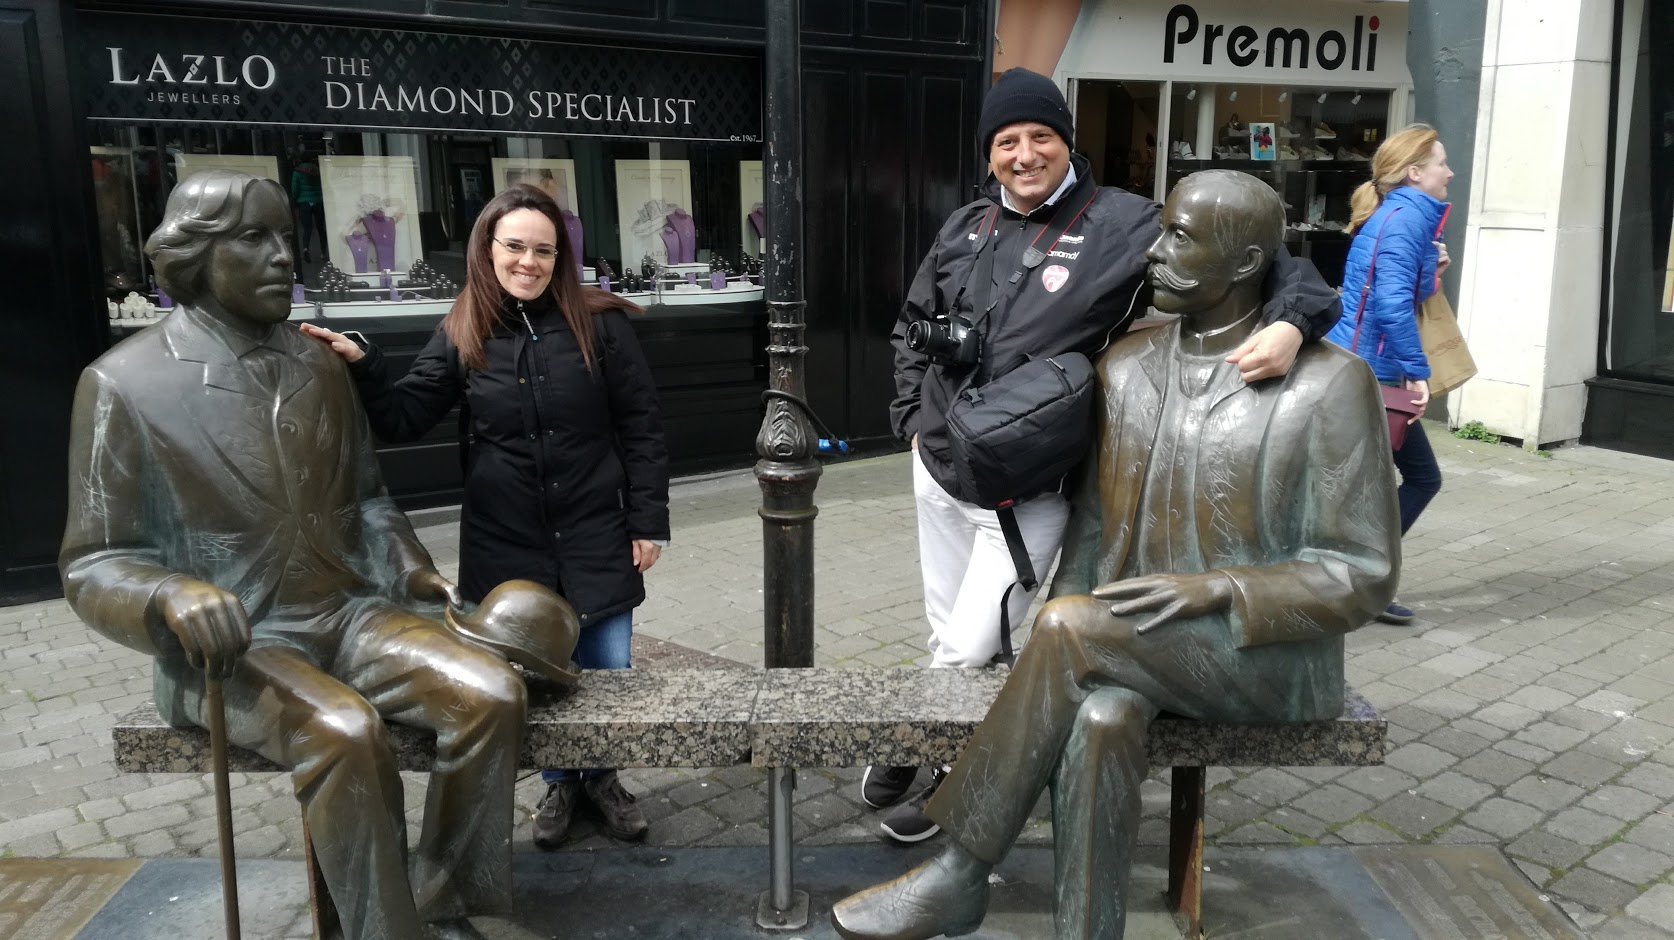 L'avventura irlandese di Beppe e Stefania – Parte 3